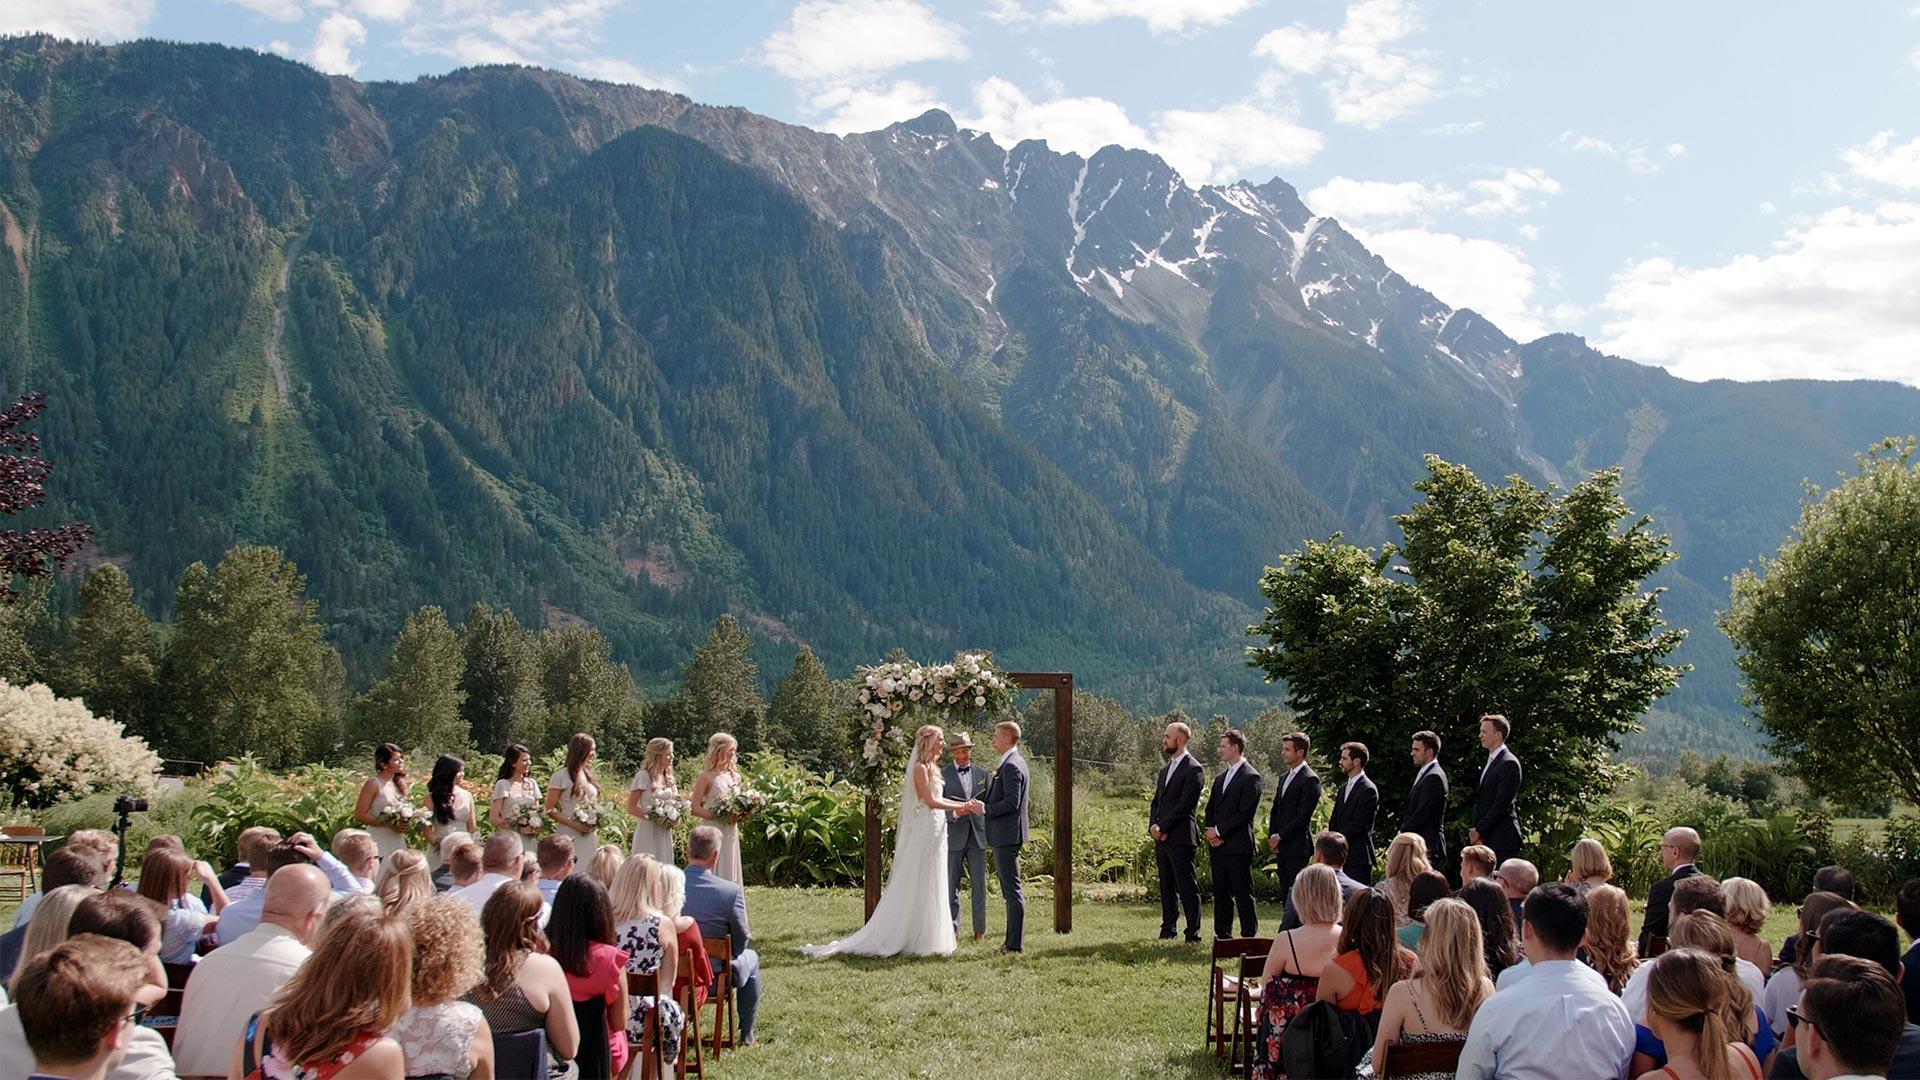 North Arm Farm Wedding Ceremony by Whistler Wedding Videographer Kismet Creative